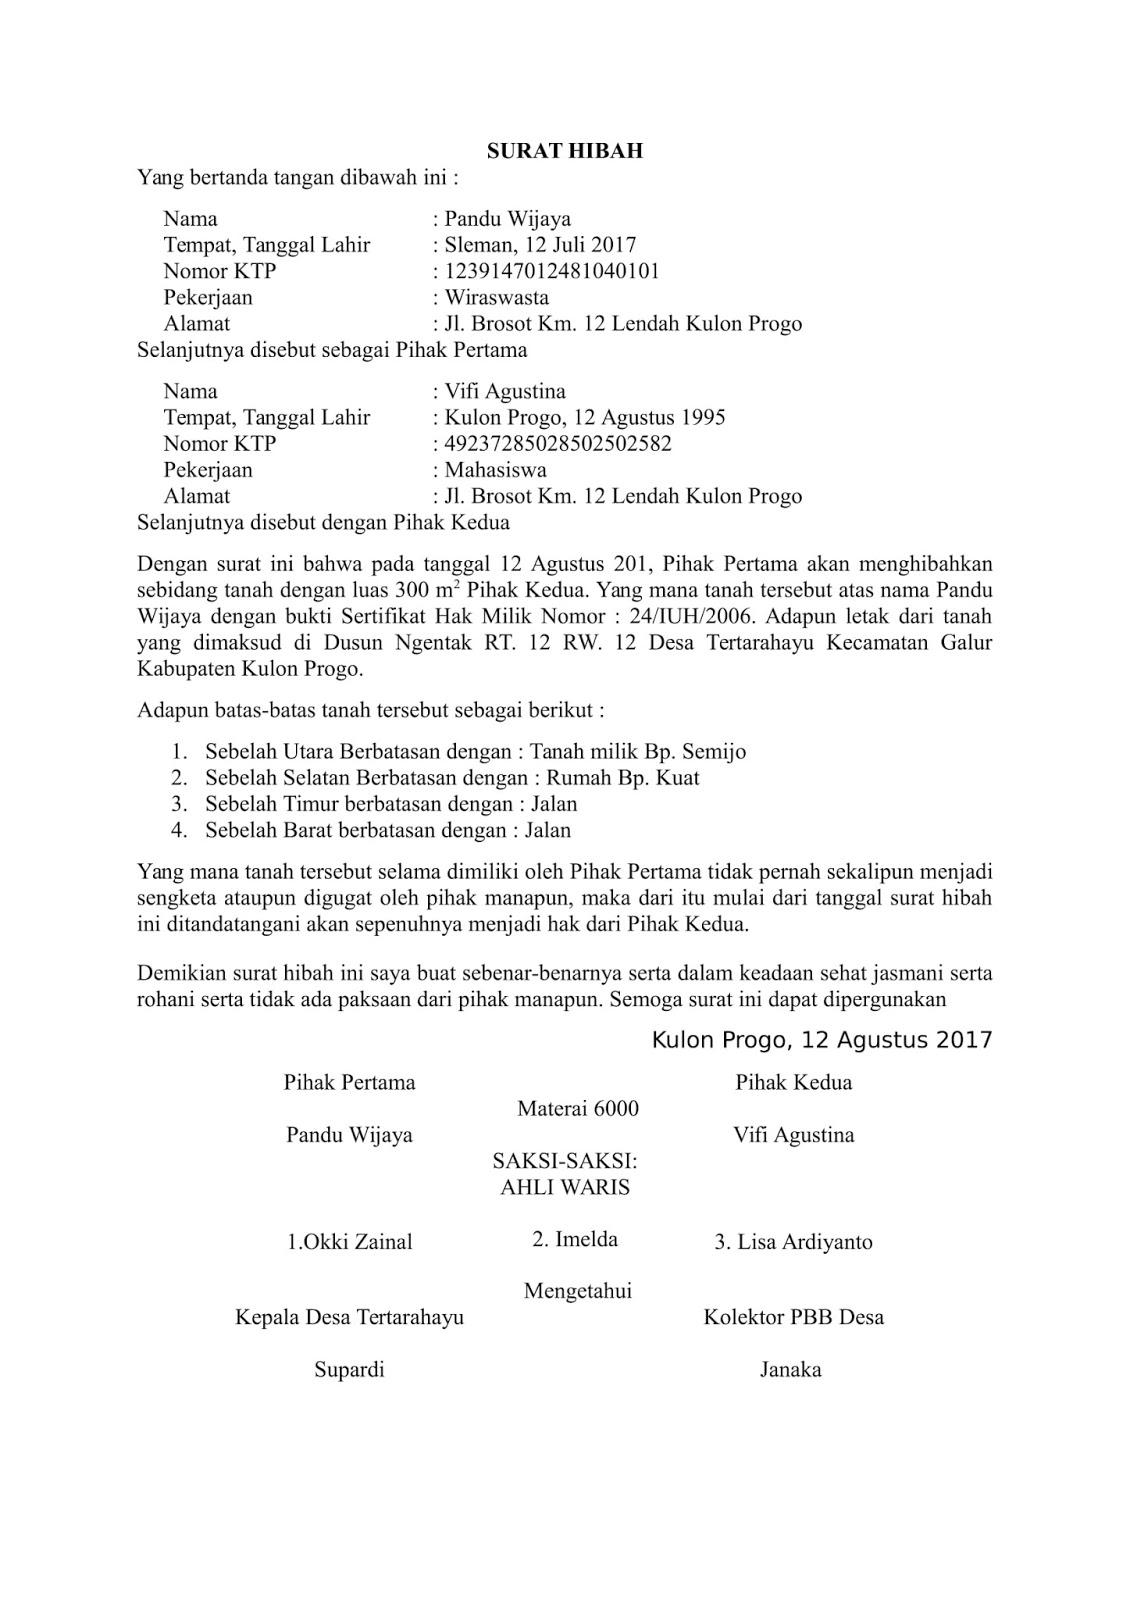 contoh surat ahli waris - wood scribd indo